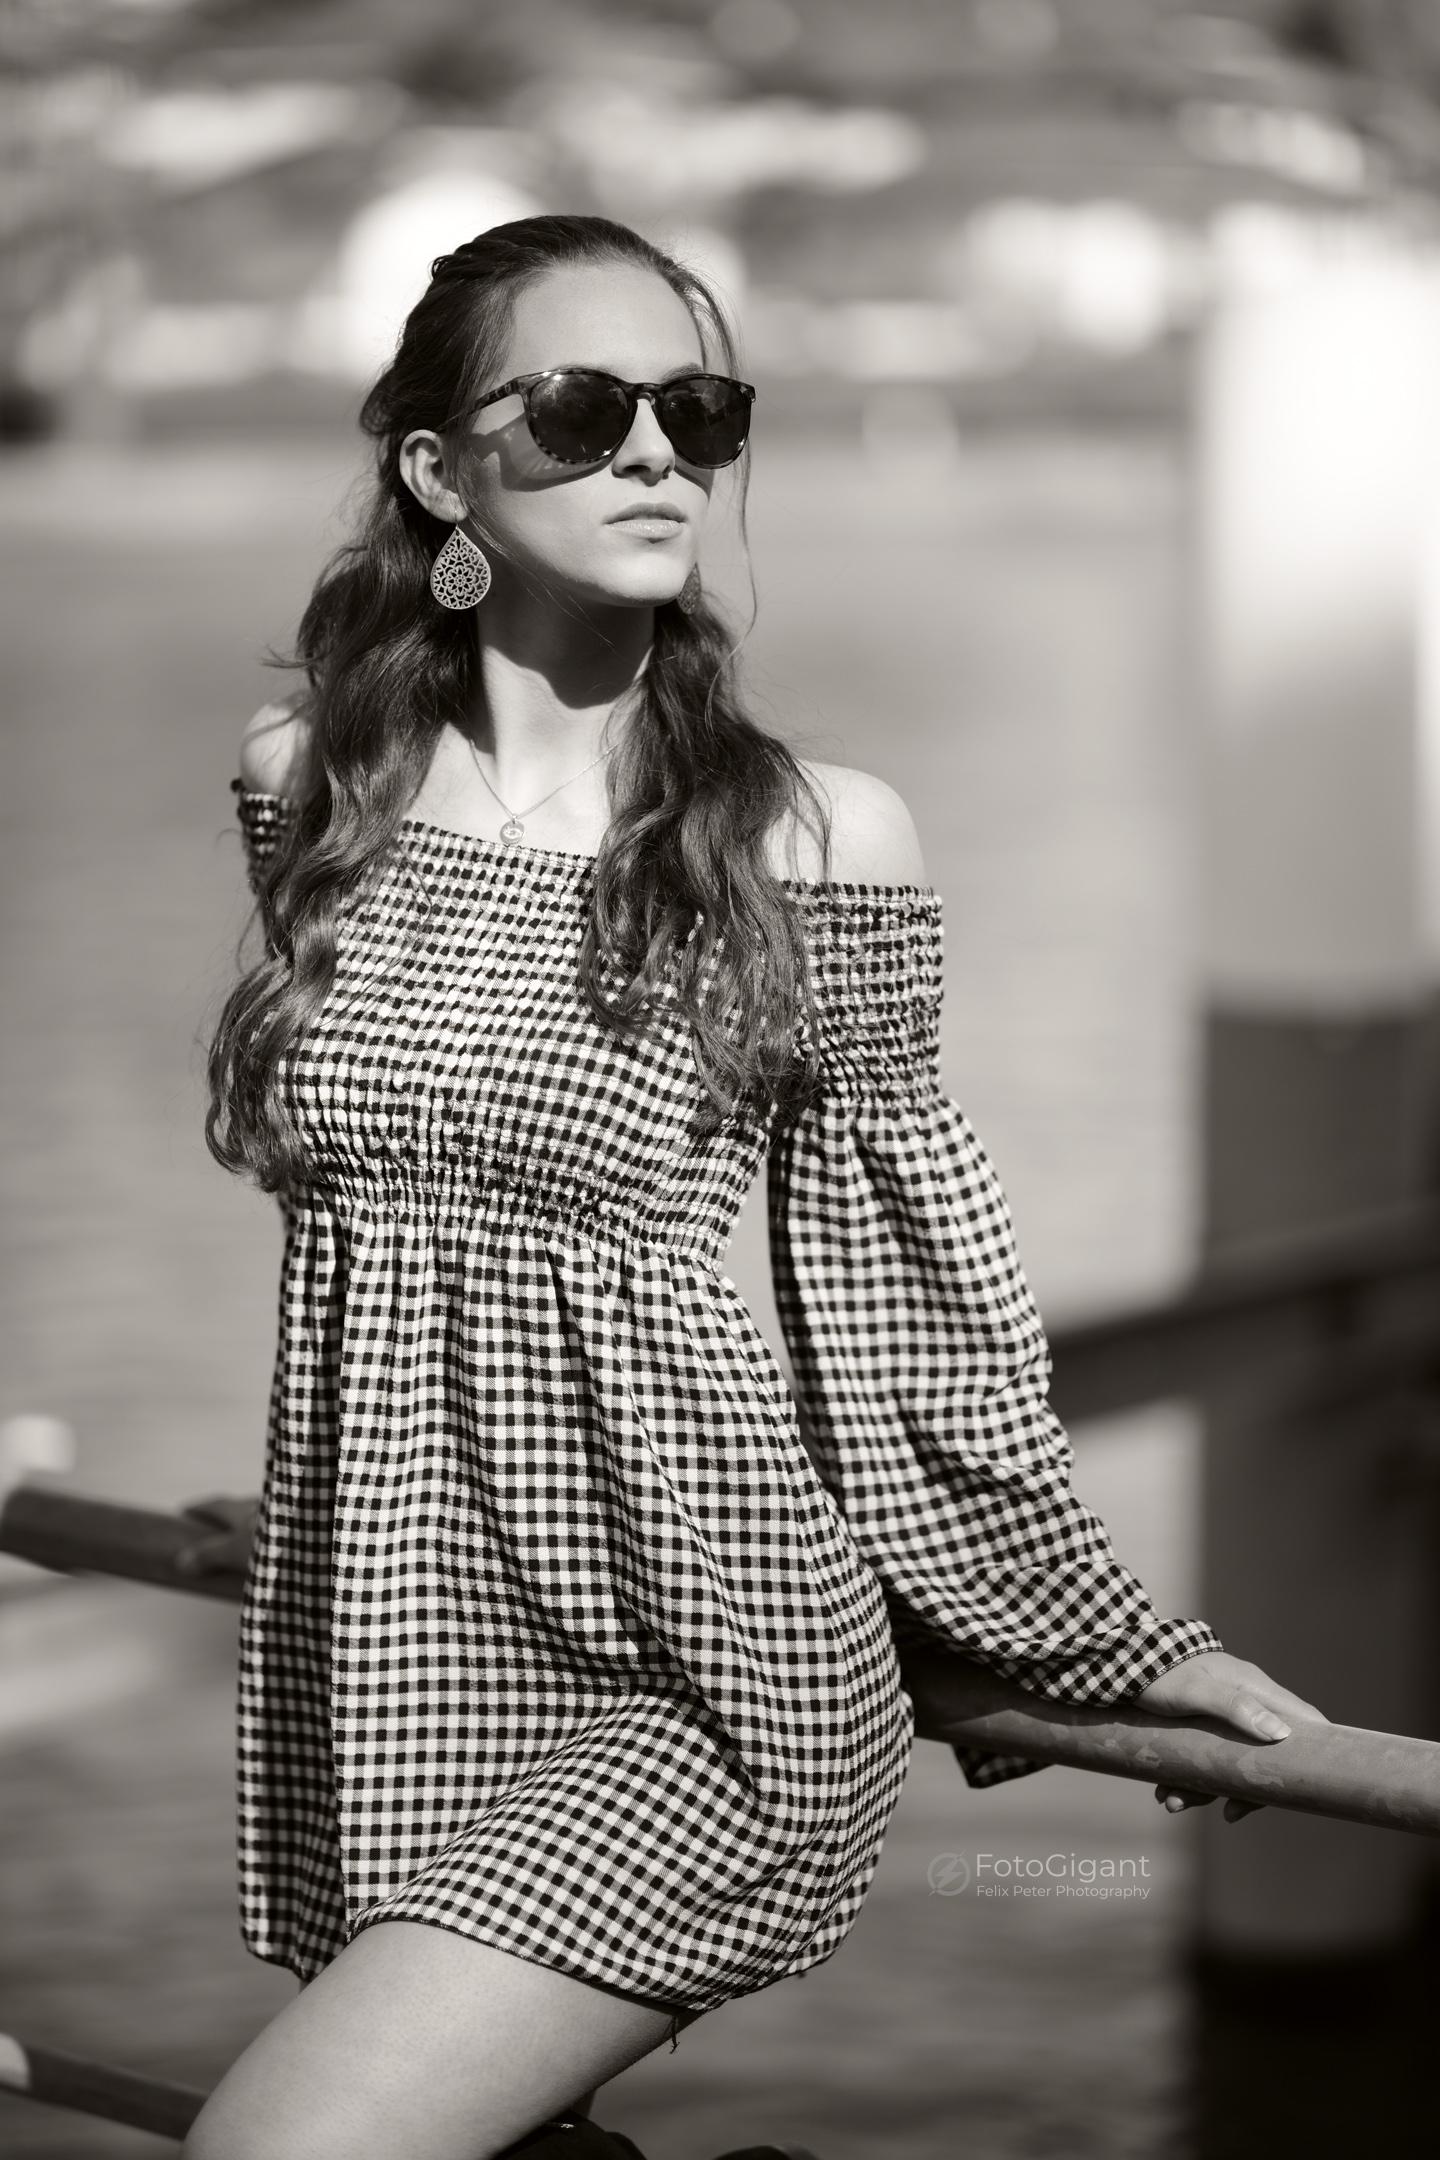 Model-Albina_by_FotoGigant_17.jpg